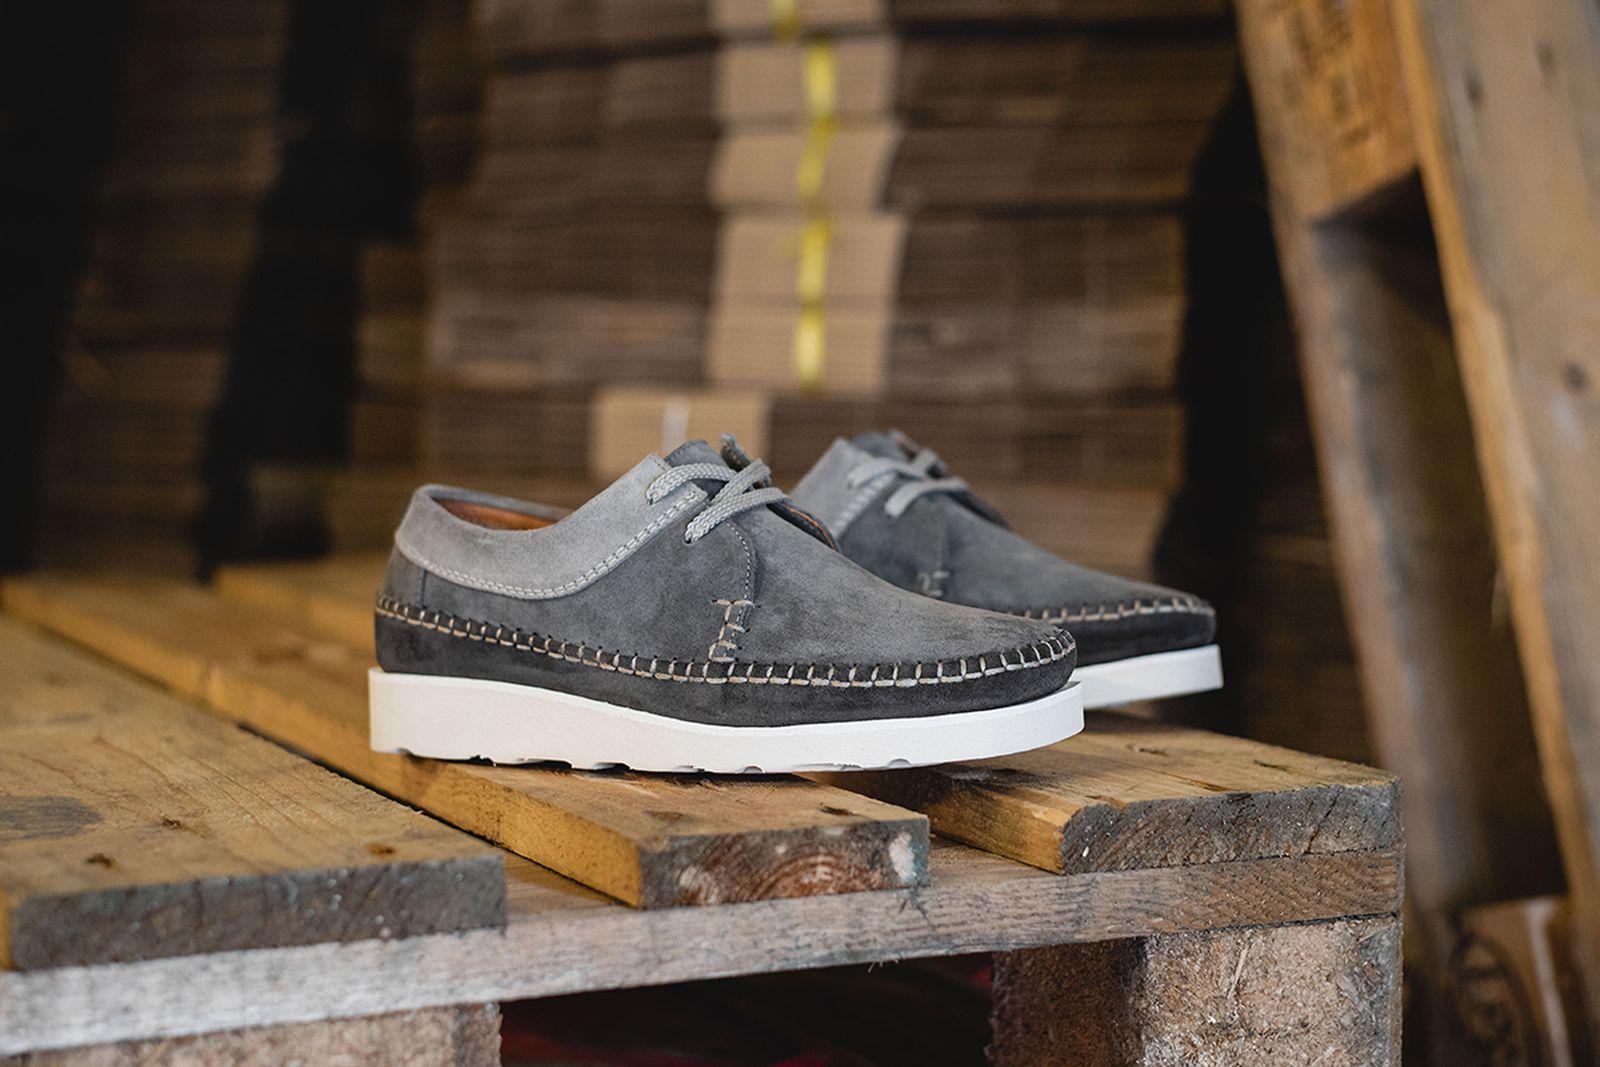 sneaker-news-02-22-2021-01